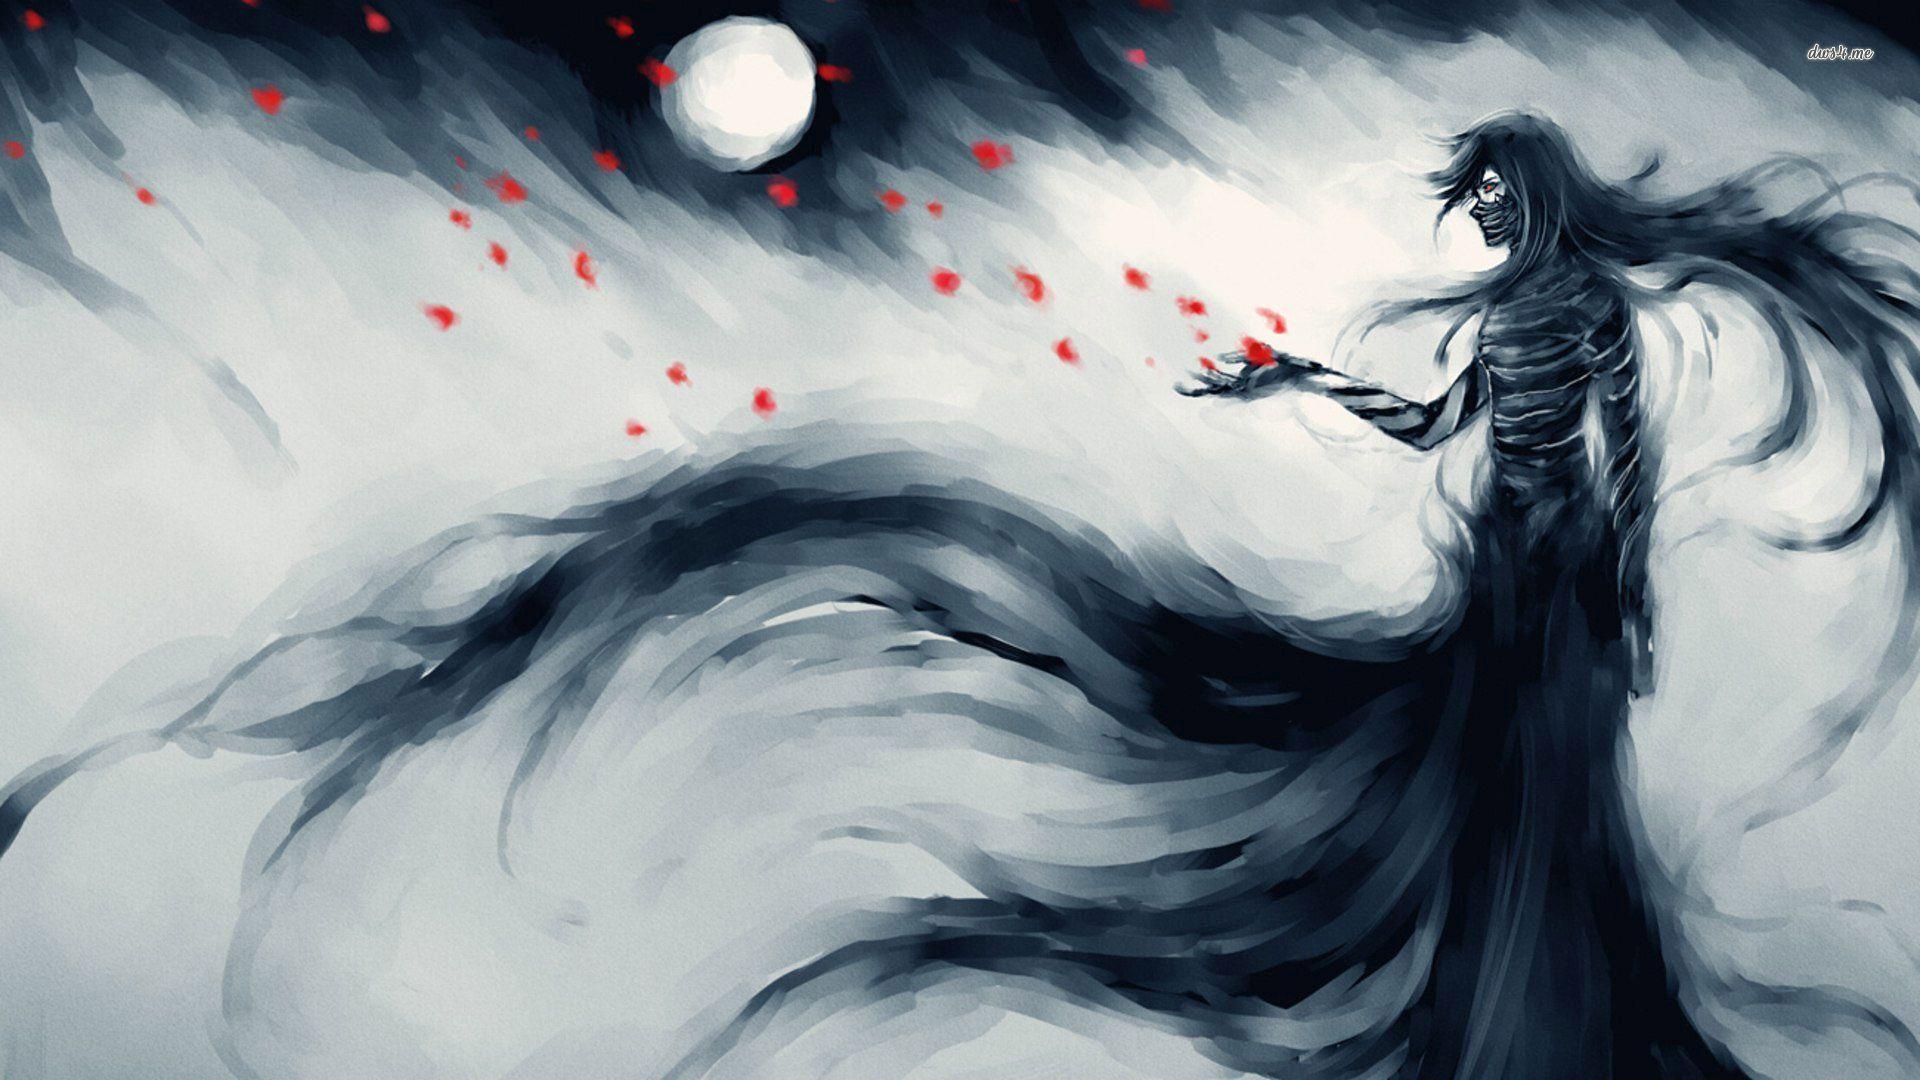 Bleach Anime Wallpaper 4k HD Art Wallpaper Kurosaki